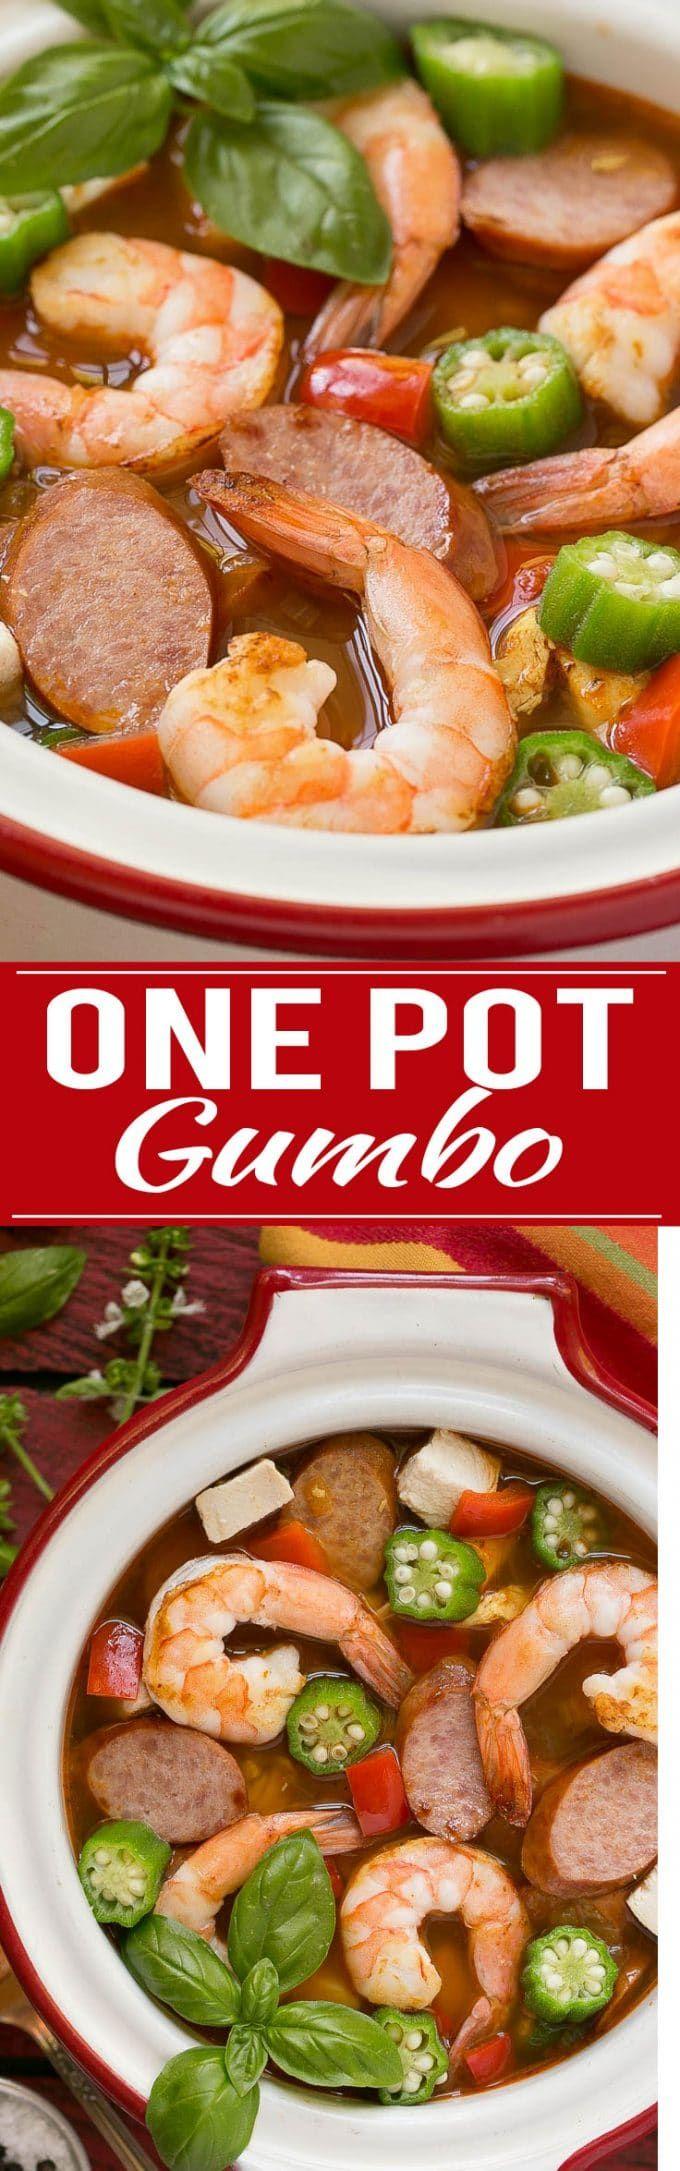 One Pot Chicken and Shrimp Gumbo Recipe   Easy Chicken and Shrimp Gumbo   One Pot Chicken and Shrimp Gumbo   Best Chicken and Shrimp Gumbo   Best Chicken and Shrimp Gumbo   Best One Pot Gumbo   Easy One Pot Gumbo